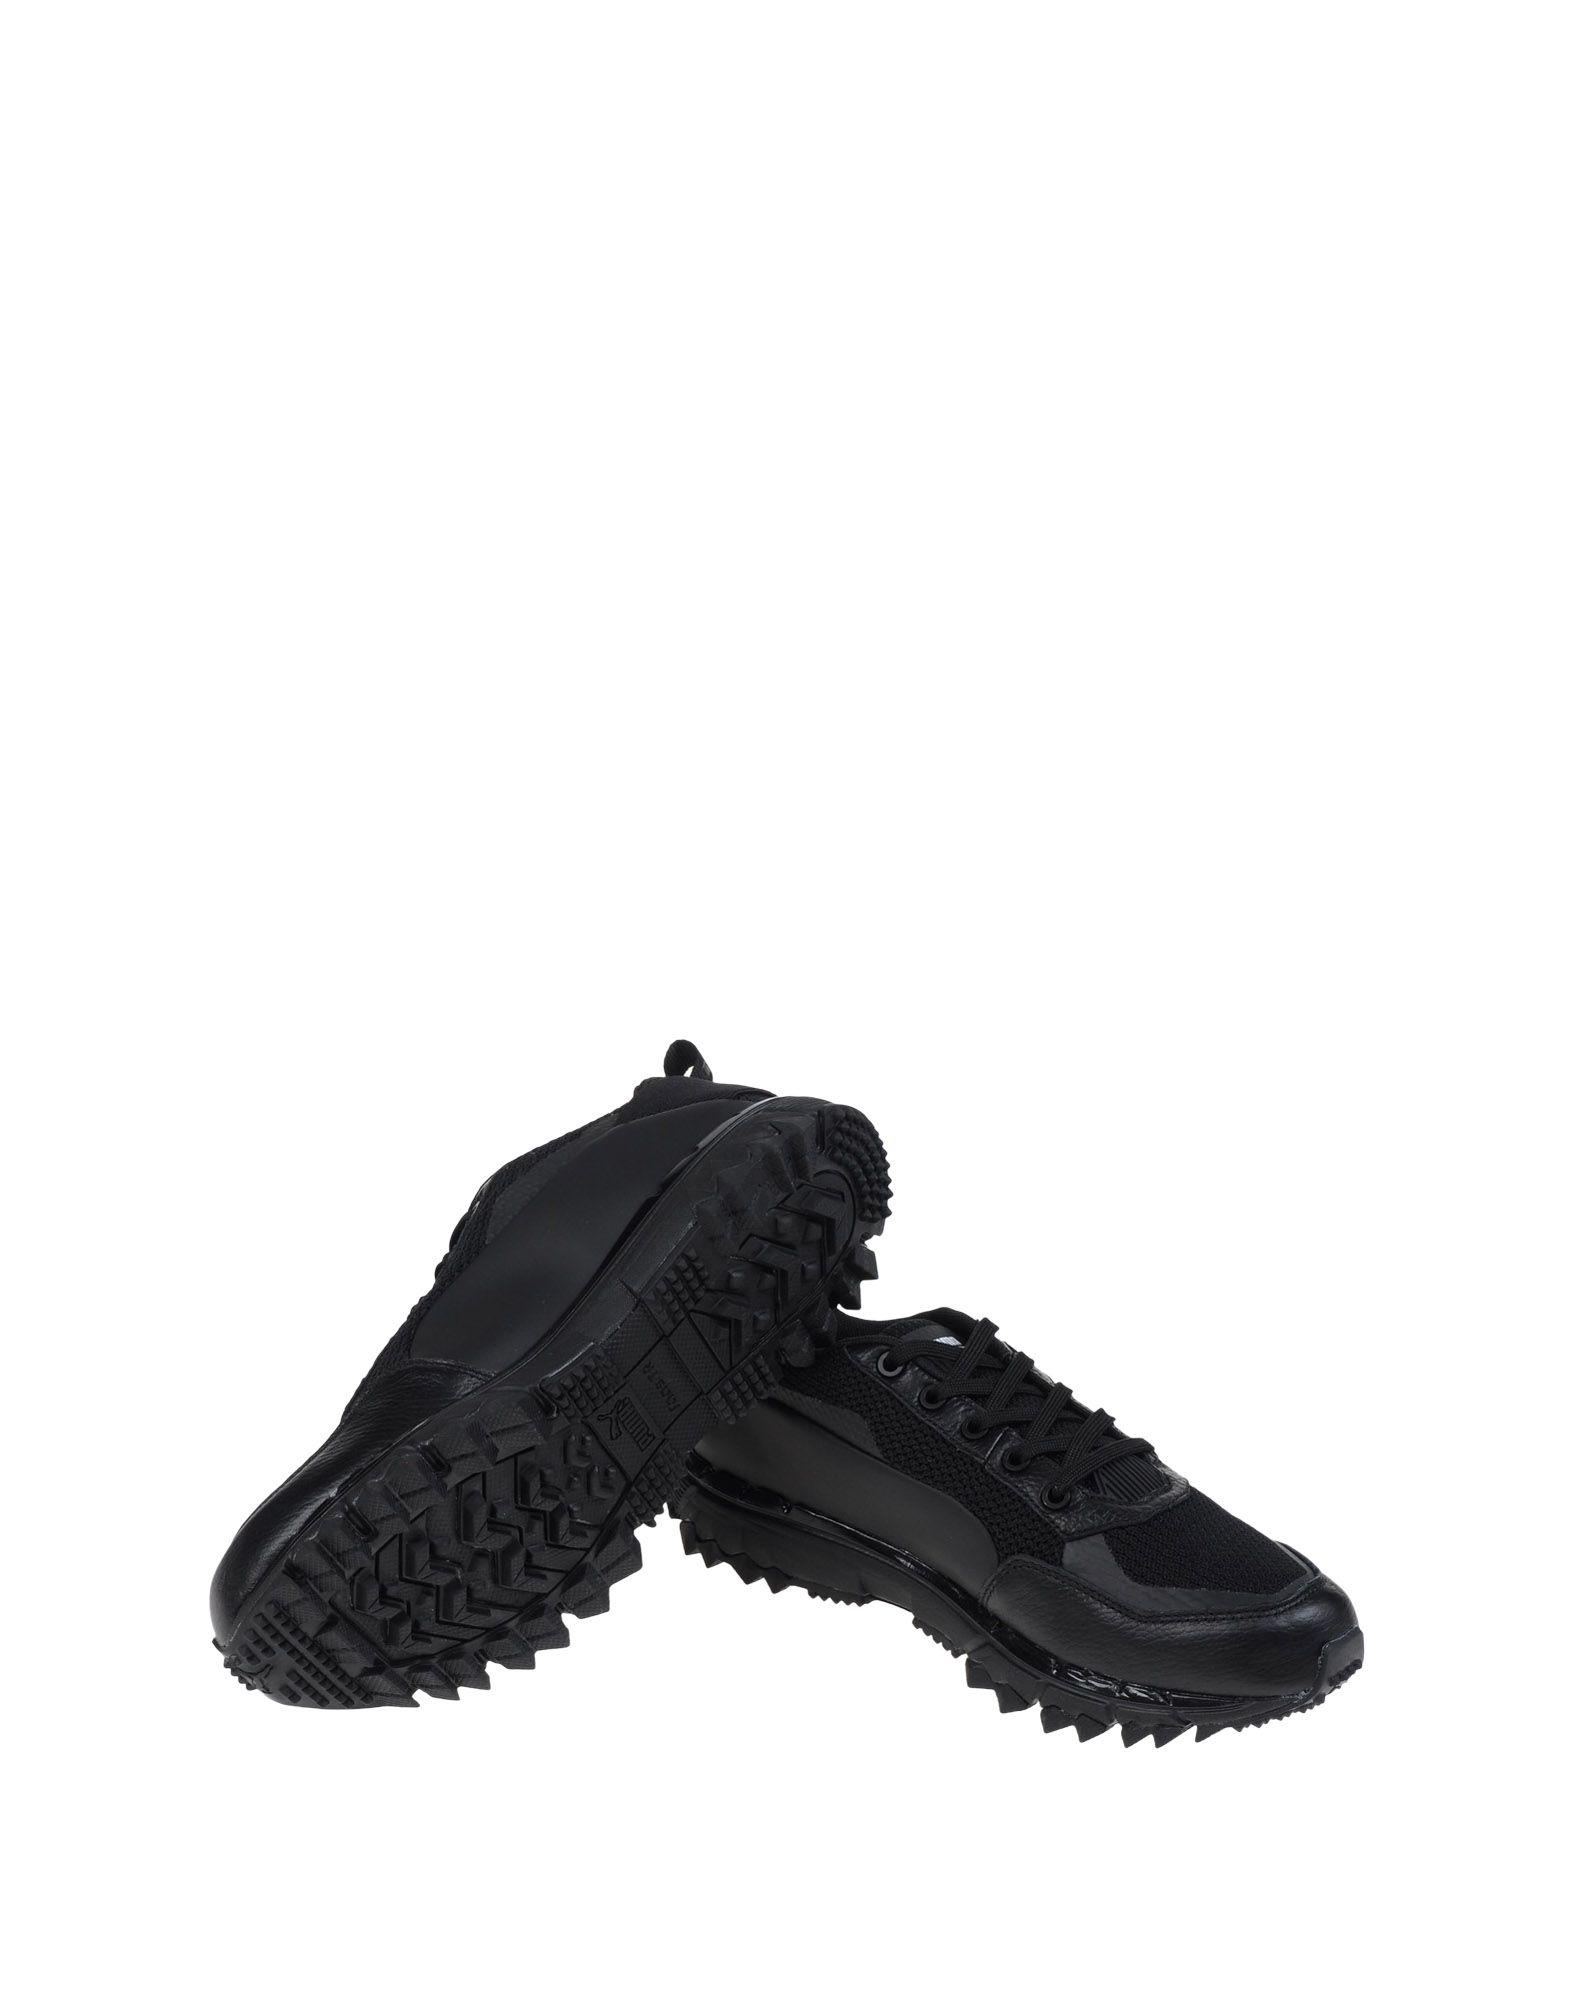 Mcq Puma Mcq Cell Track Lo  11096610HO Heiße Schuhe Schuhe Schuhe ade5a4